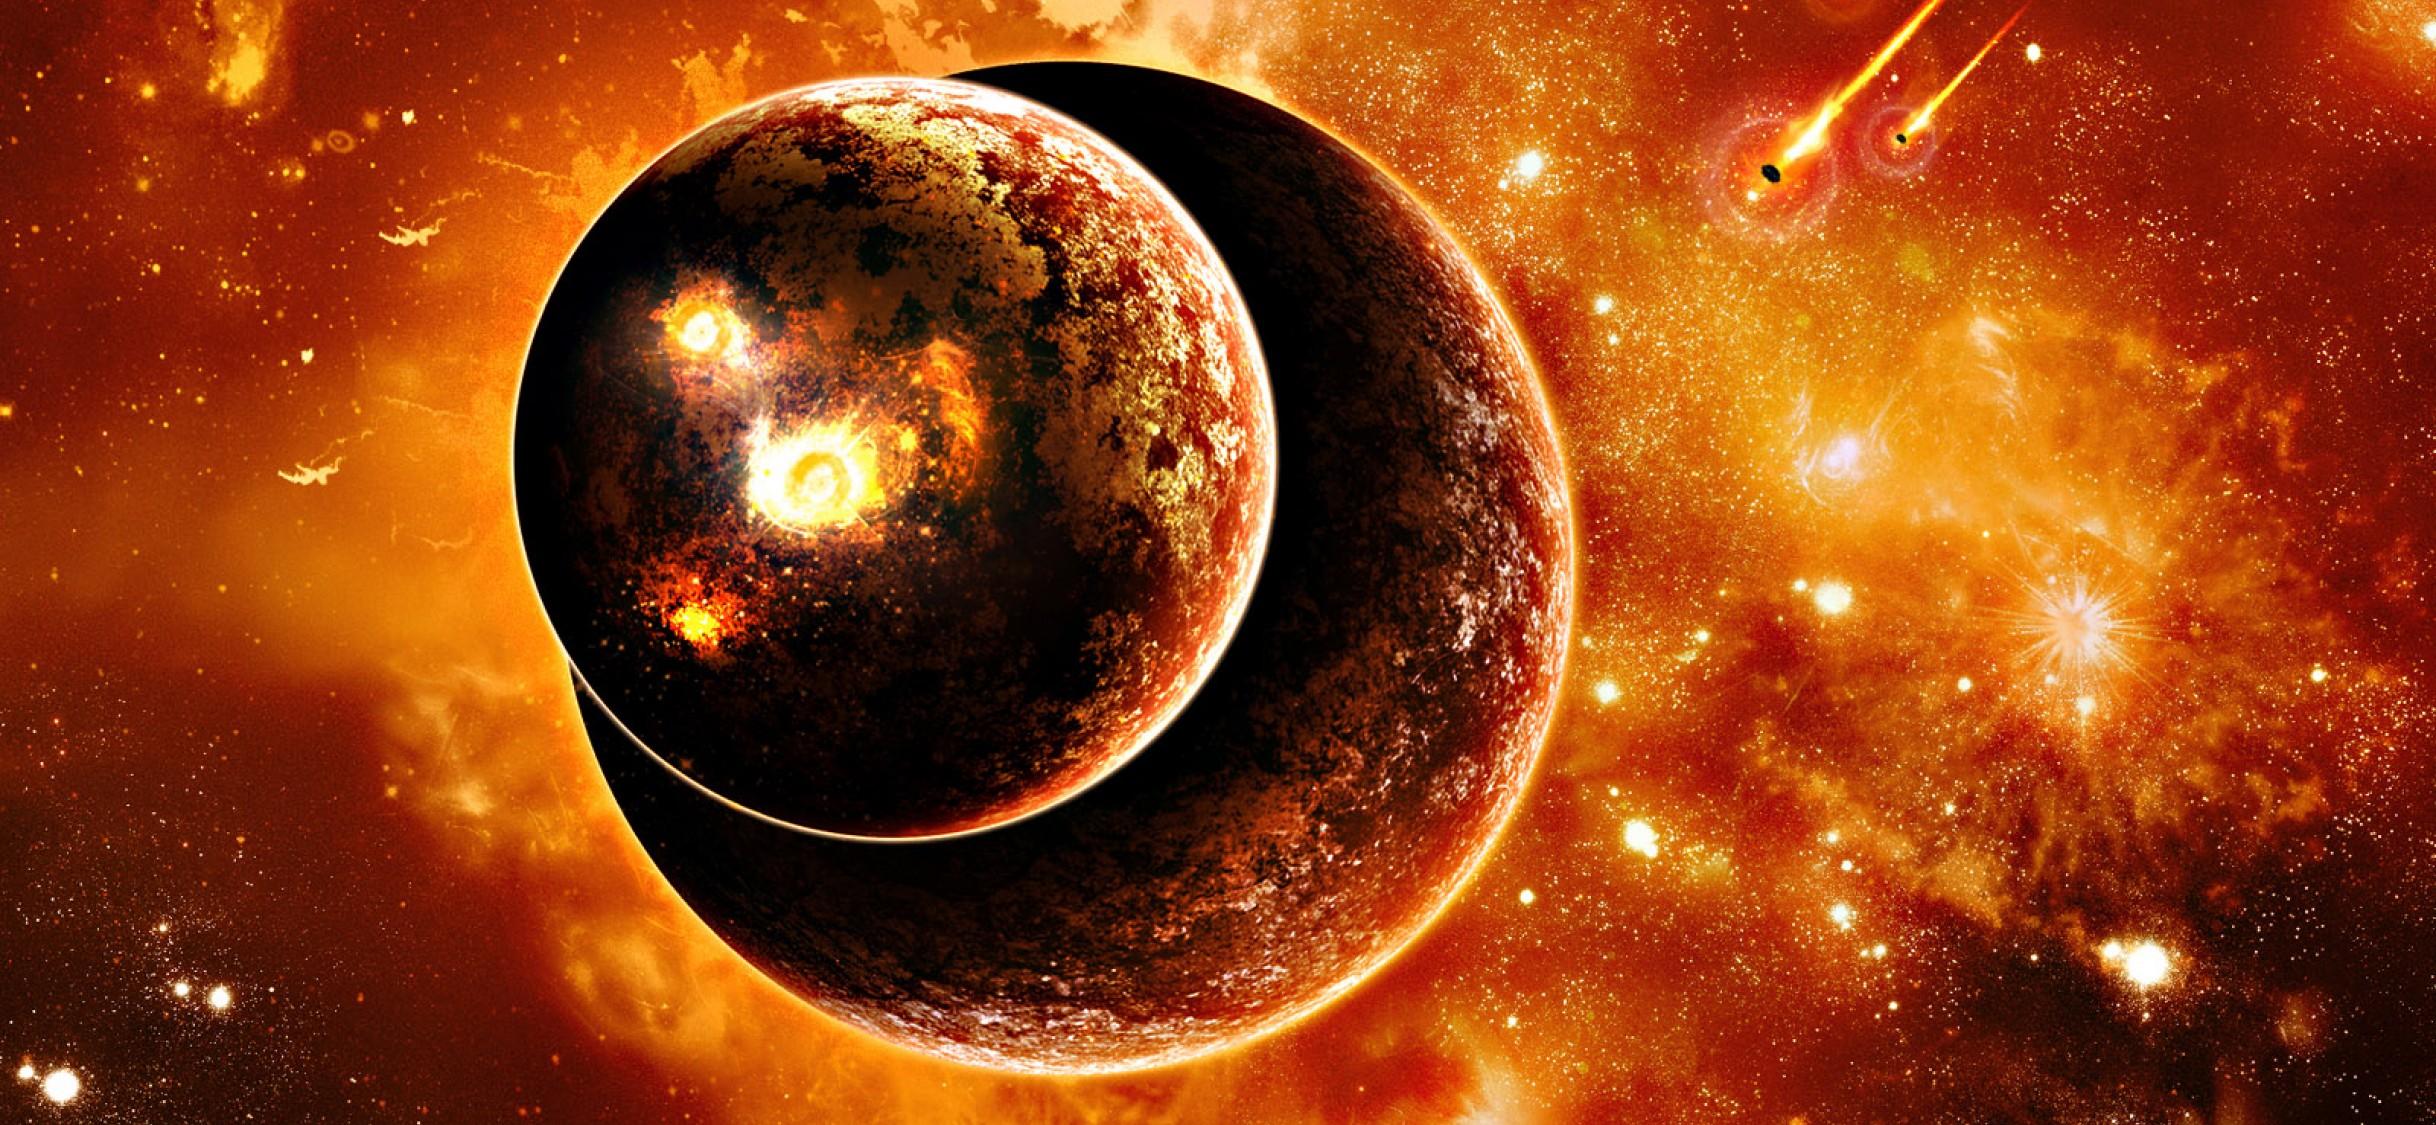 Download Burning Planets Live Wallpaper For Desktop And